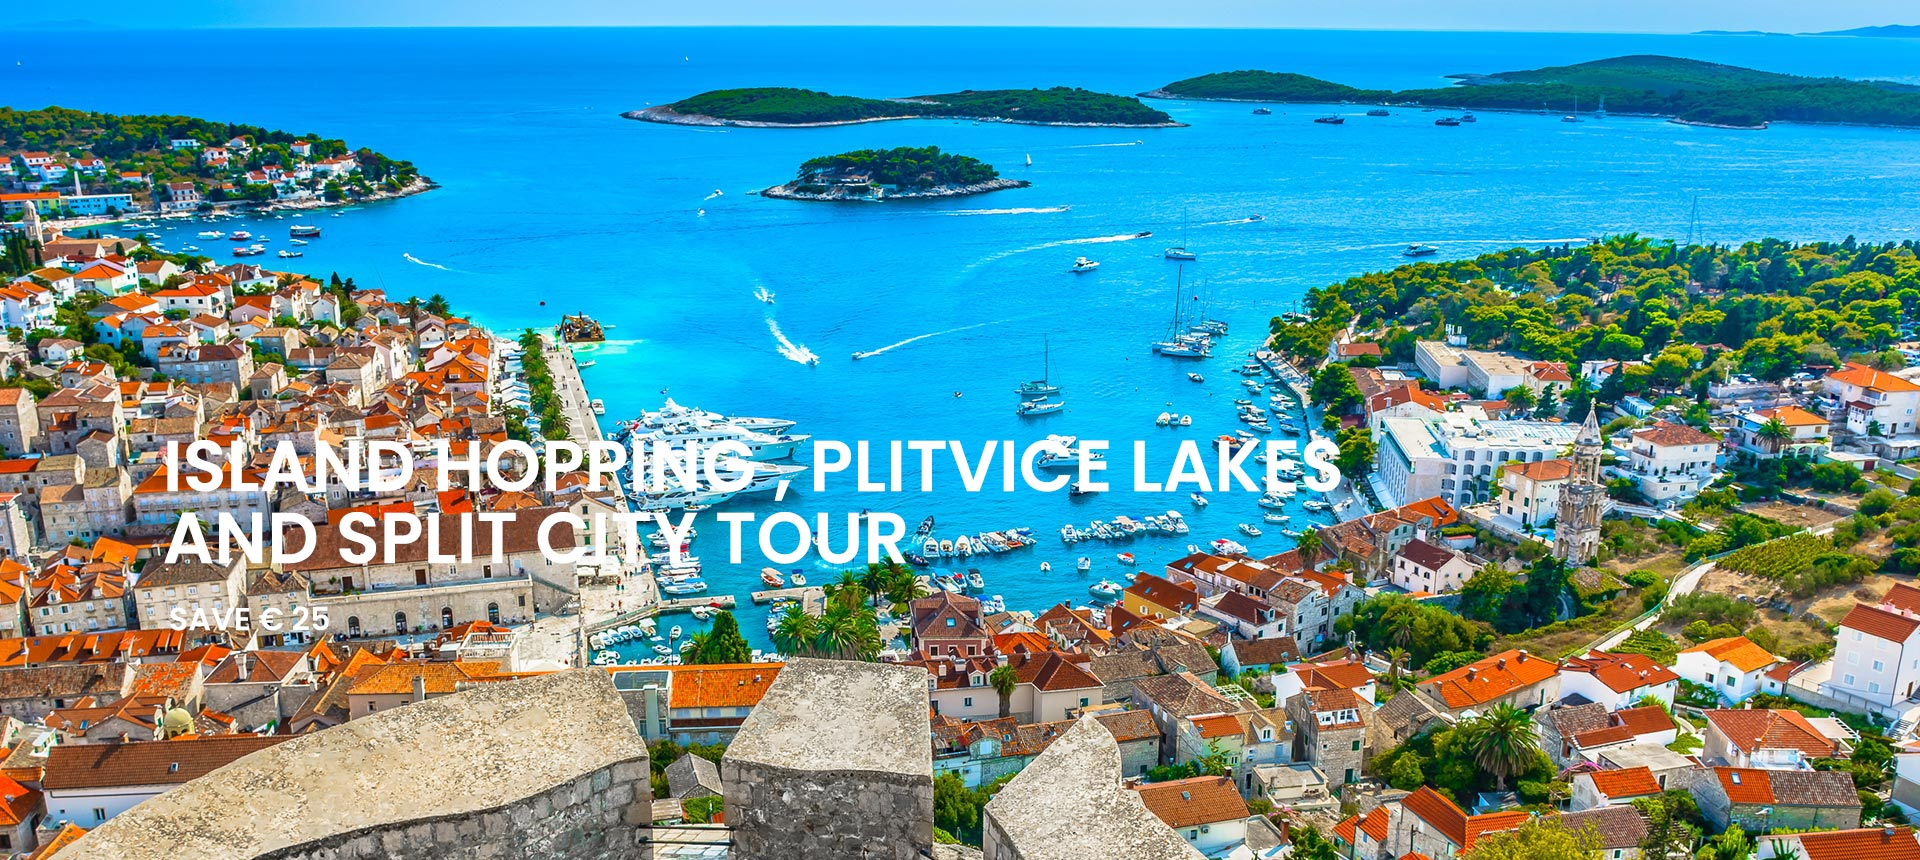 Blue Lagoon, Hvar and Trogir Tour, Plitvice Lakes and Split city tour